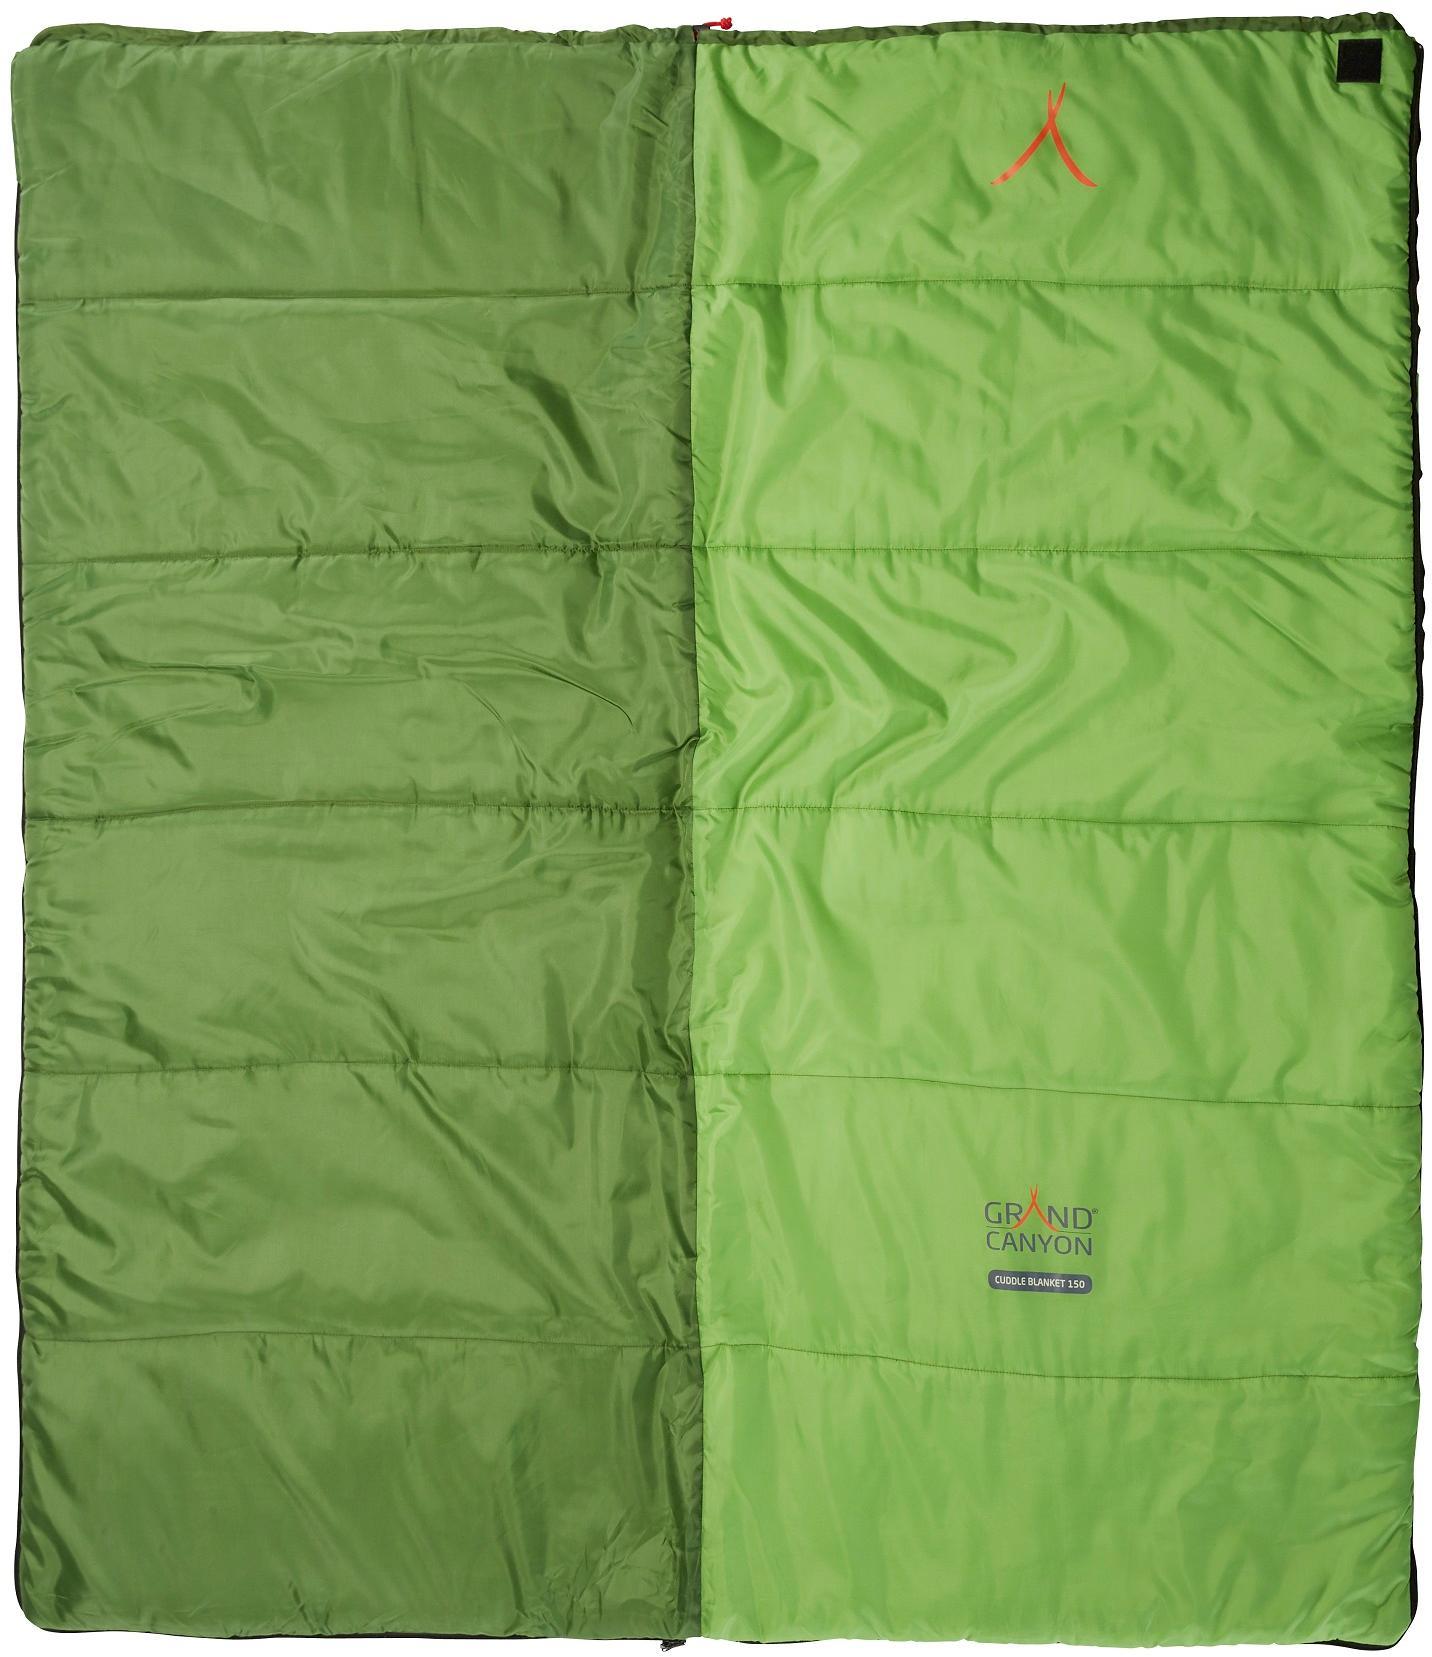 brand new 0658e 1b3f5 Grand Canyon Cuddle Blanket 150 Schlafsack, 150x65cm, grün